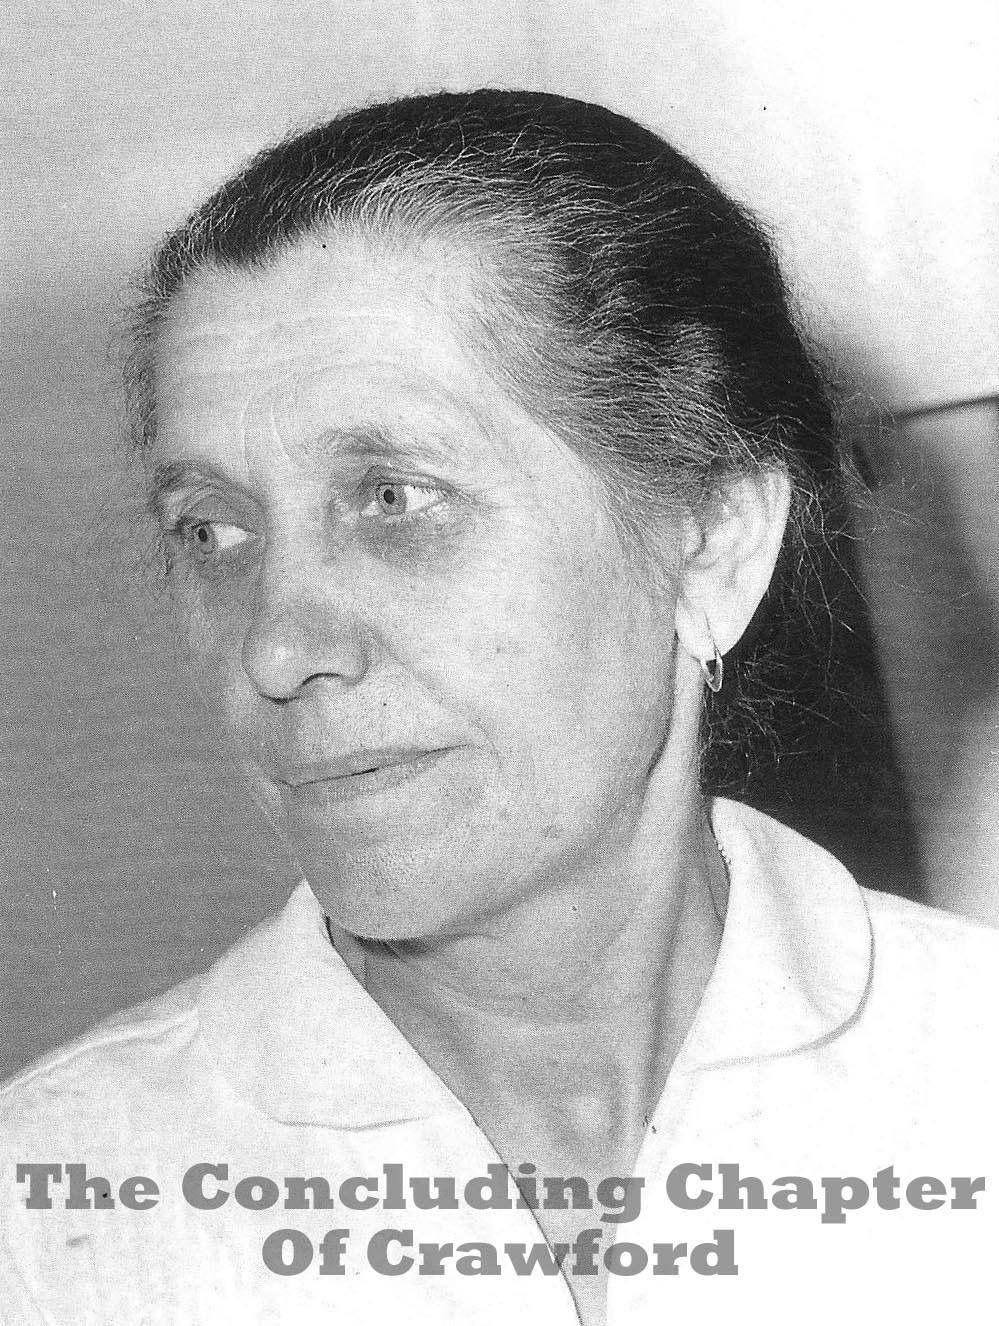 Communication on this topic: Joyce Guy, anna-keaveney/